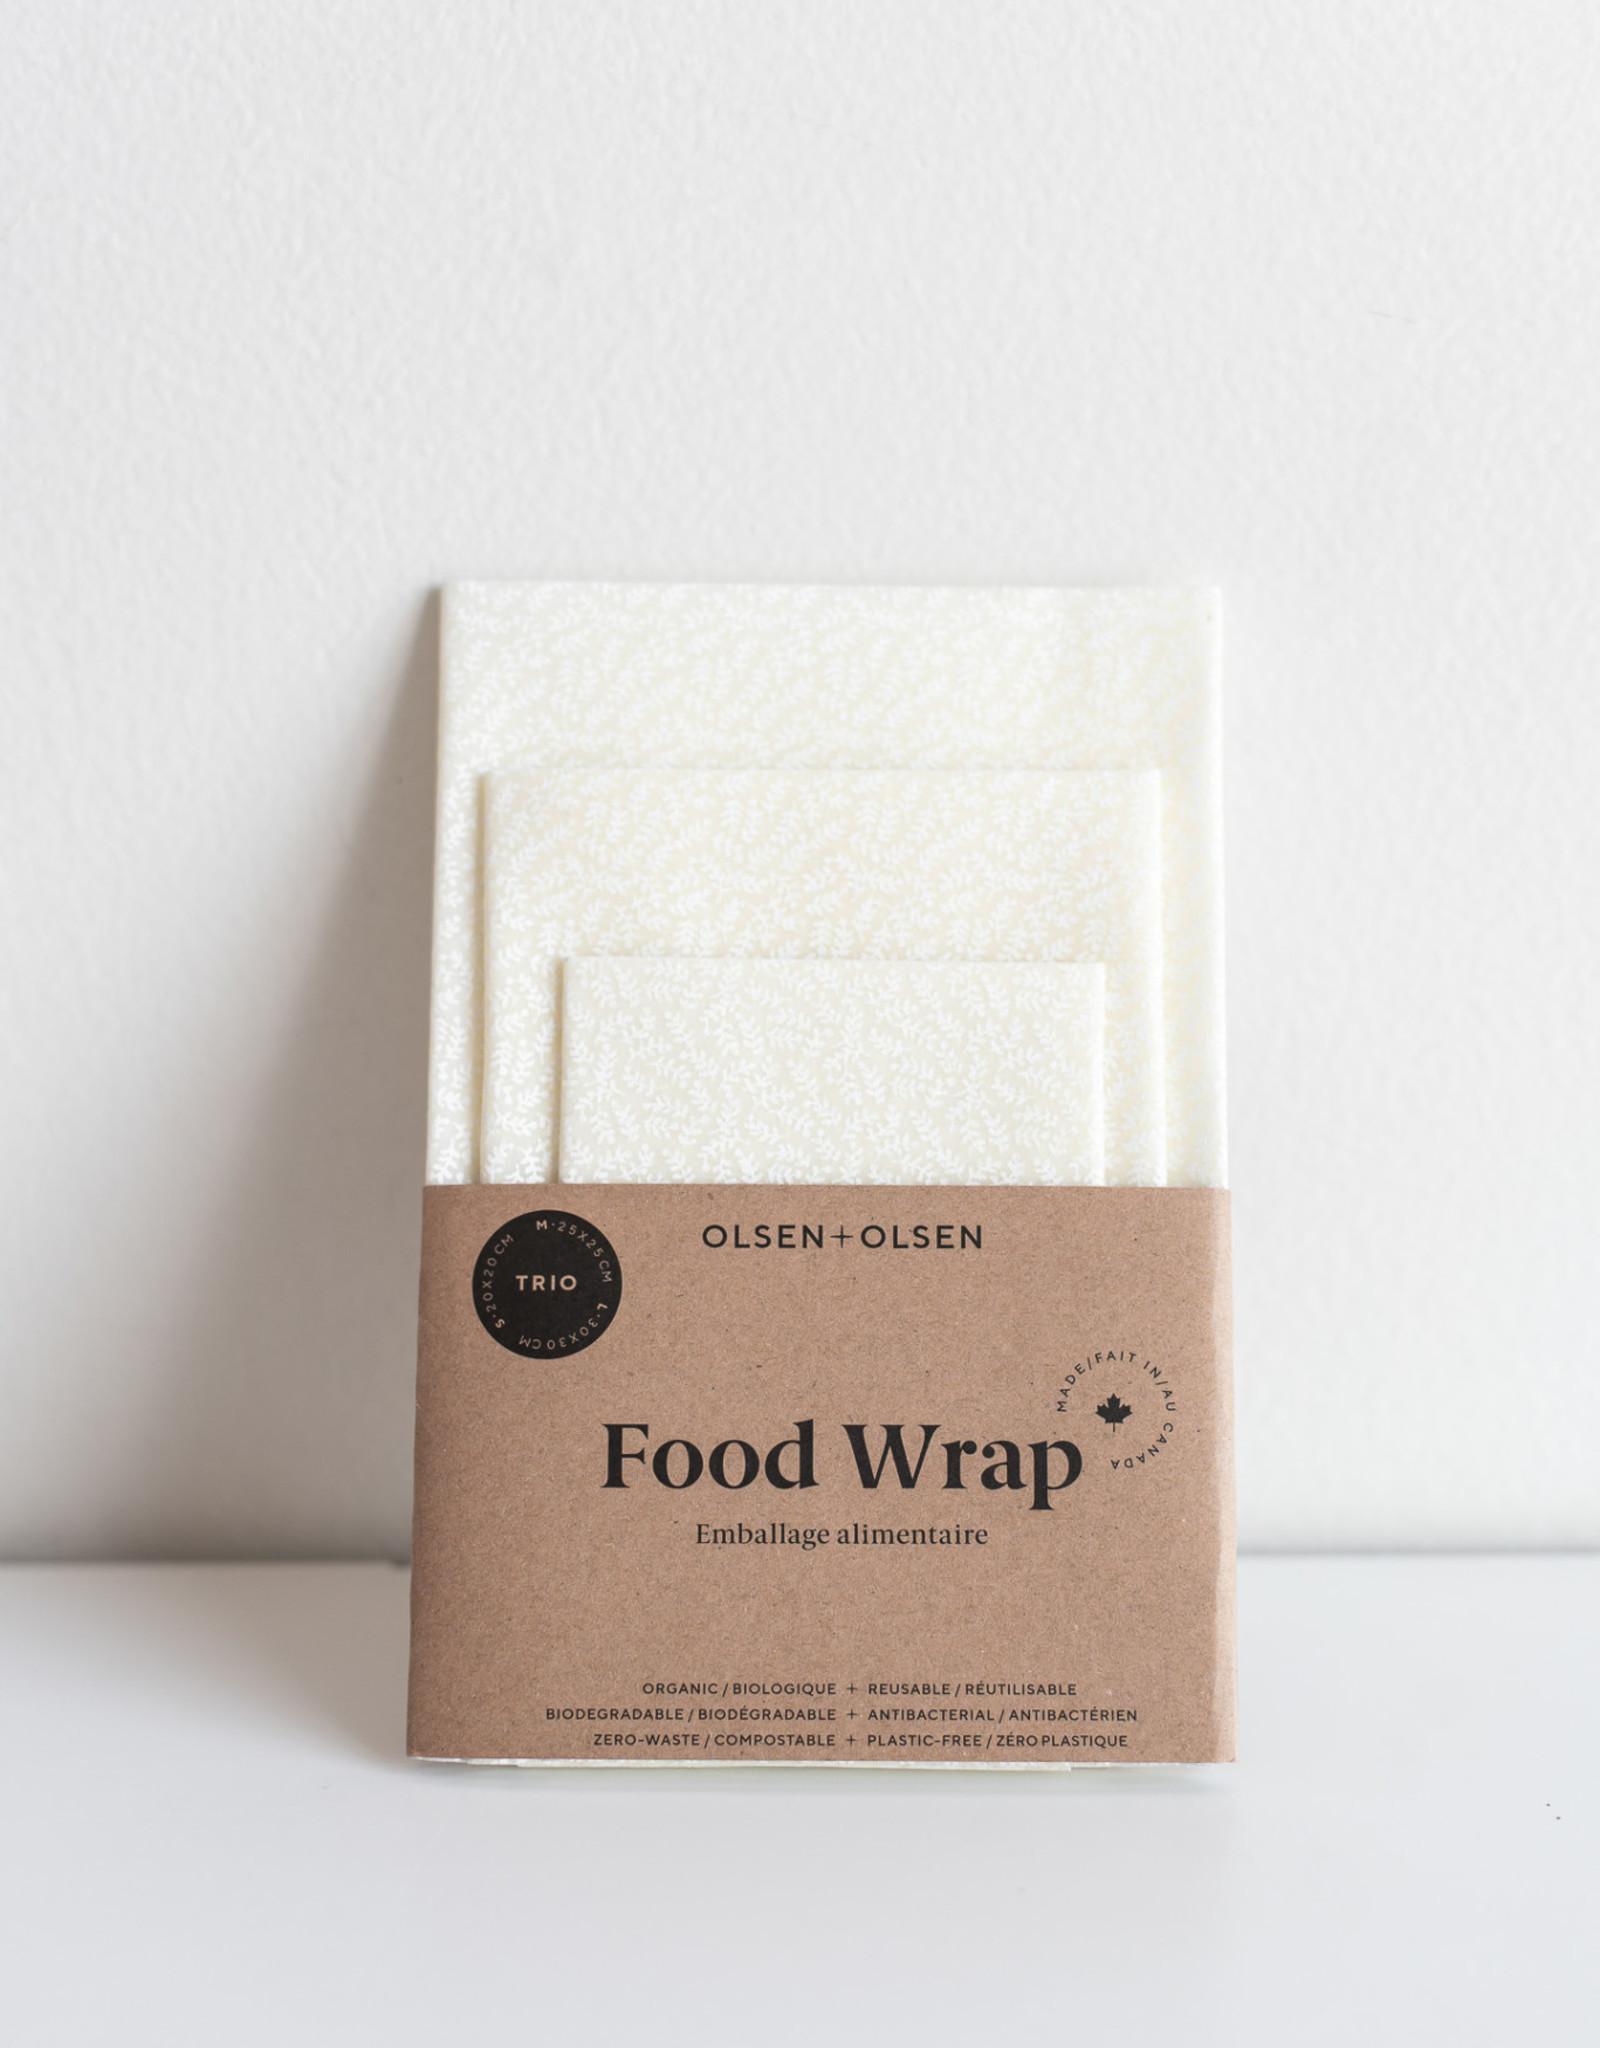 Olsen Olsen Trio Film alimentaire- Fleuris